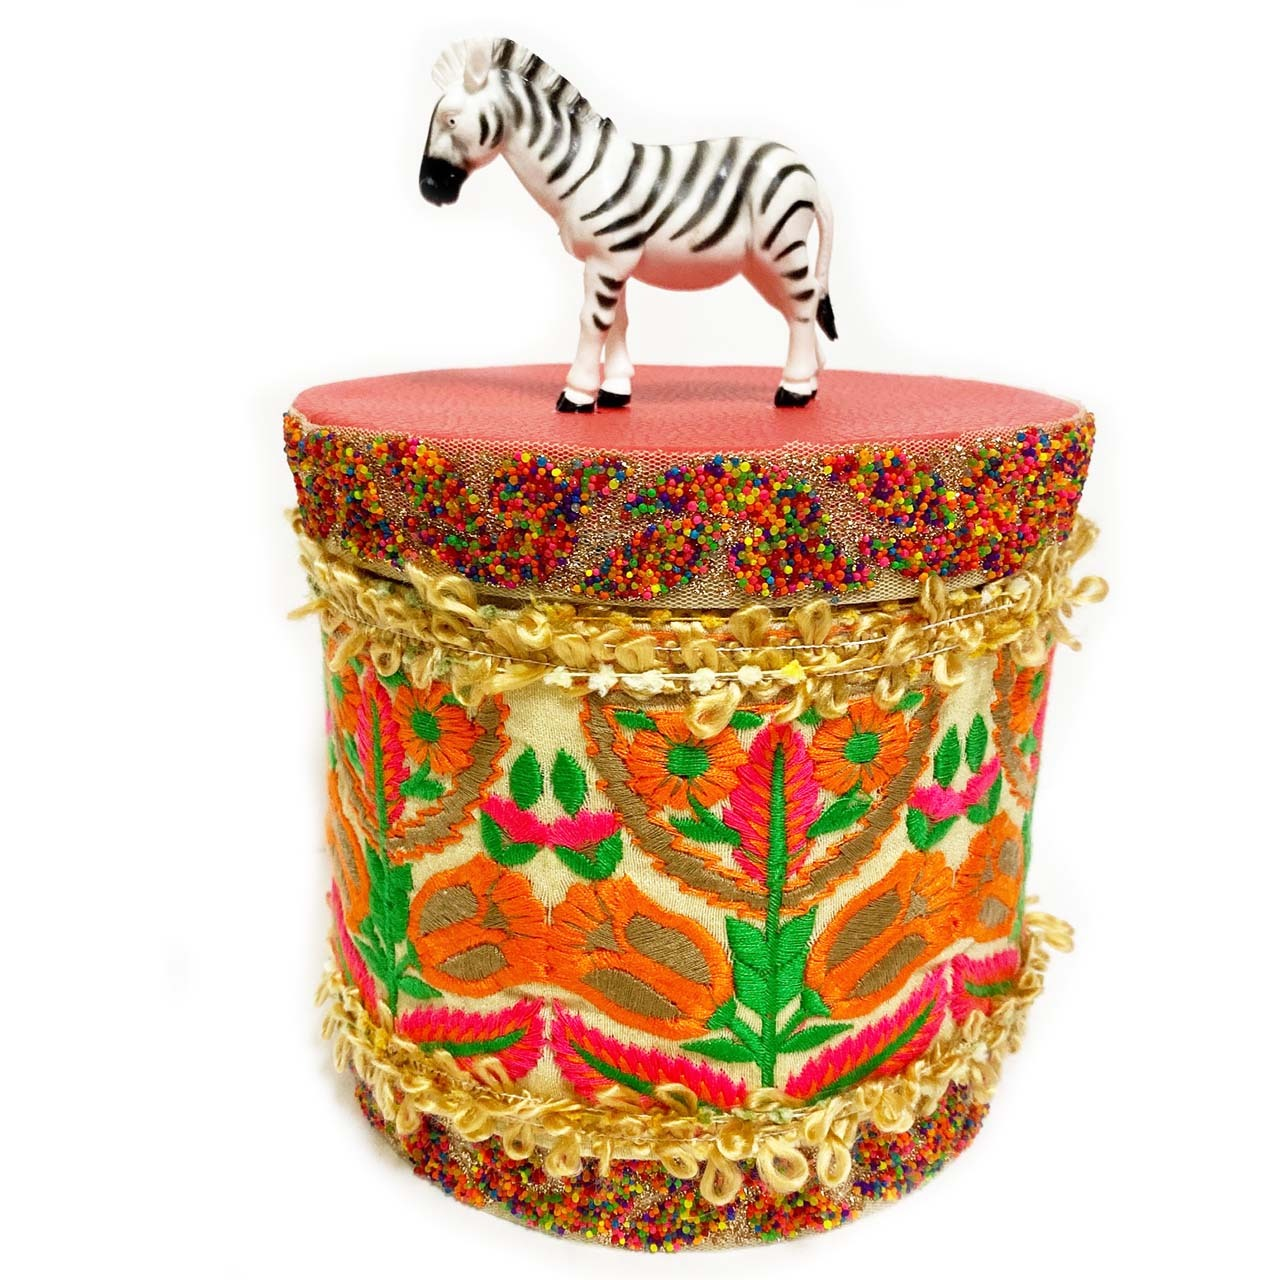 hug2フードボックスfood box(zebra)